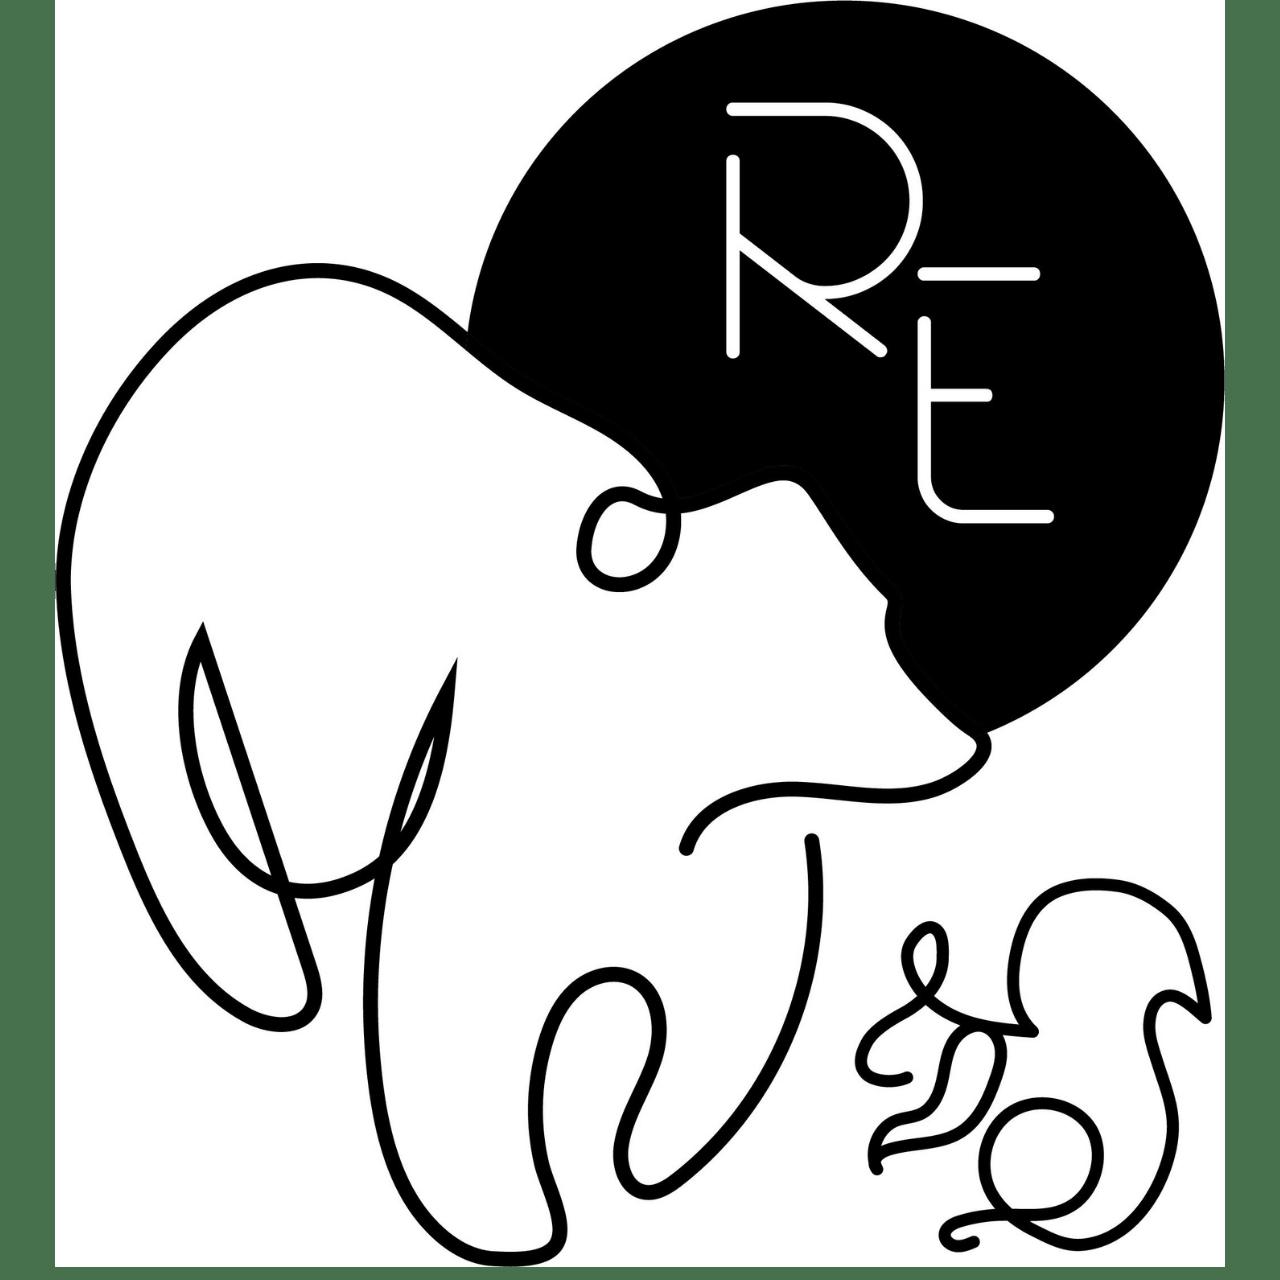 Re-100